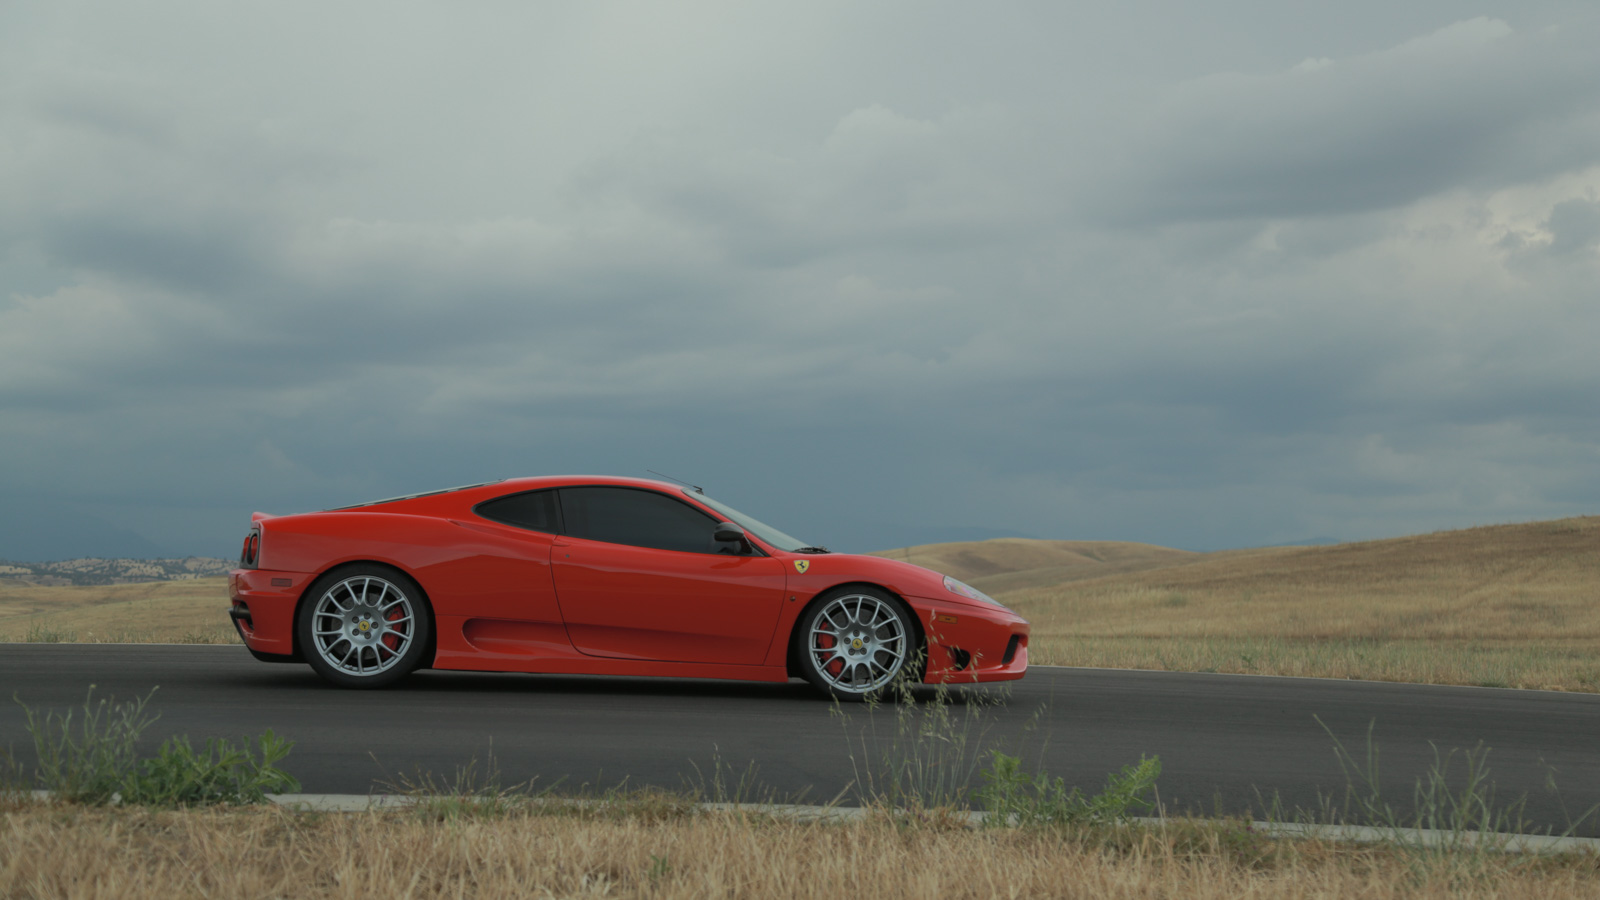 ferrari 6 10 λόγοι που η Ferrari 360 Challenge Stradale ανήκει στο γκαράζ των ονείρων μας Ferrari, Ferrari 360 Challenge Stradale, Ferrari 360 Modena, Ferrari Challenge Stradale, videos